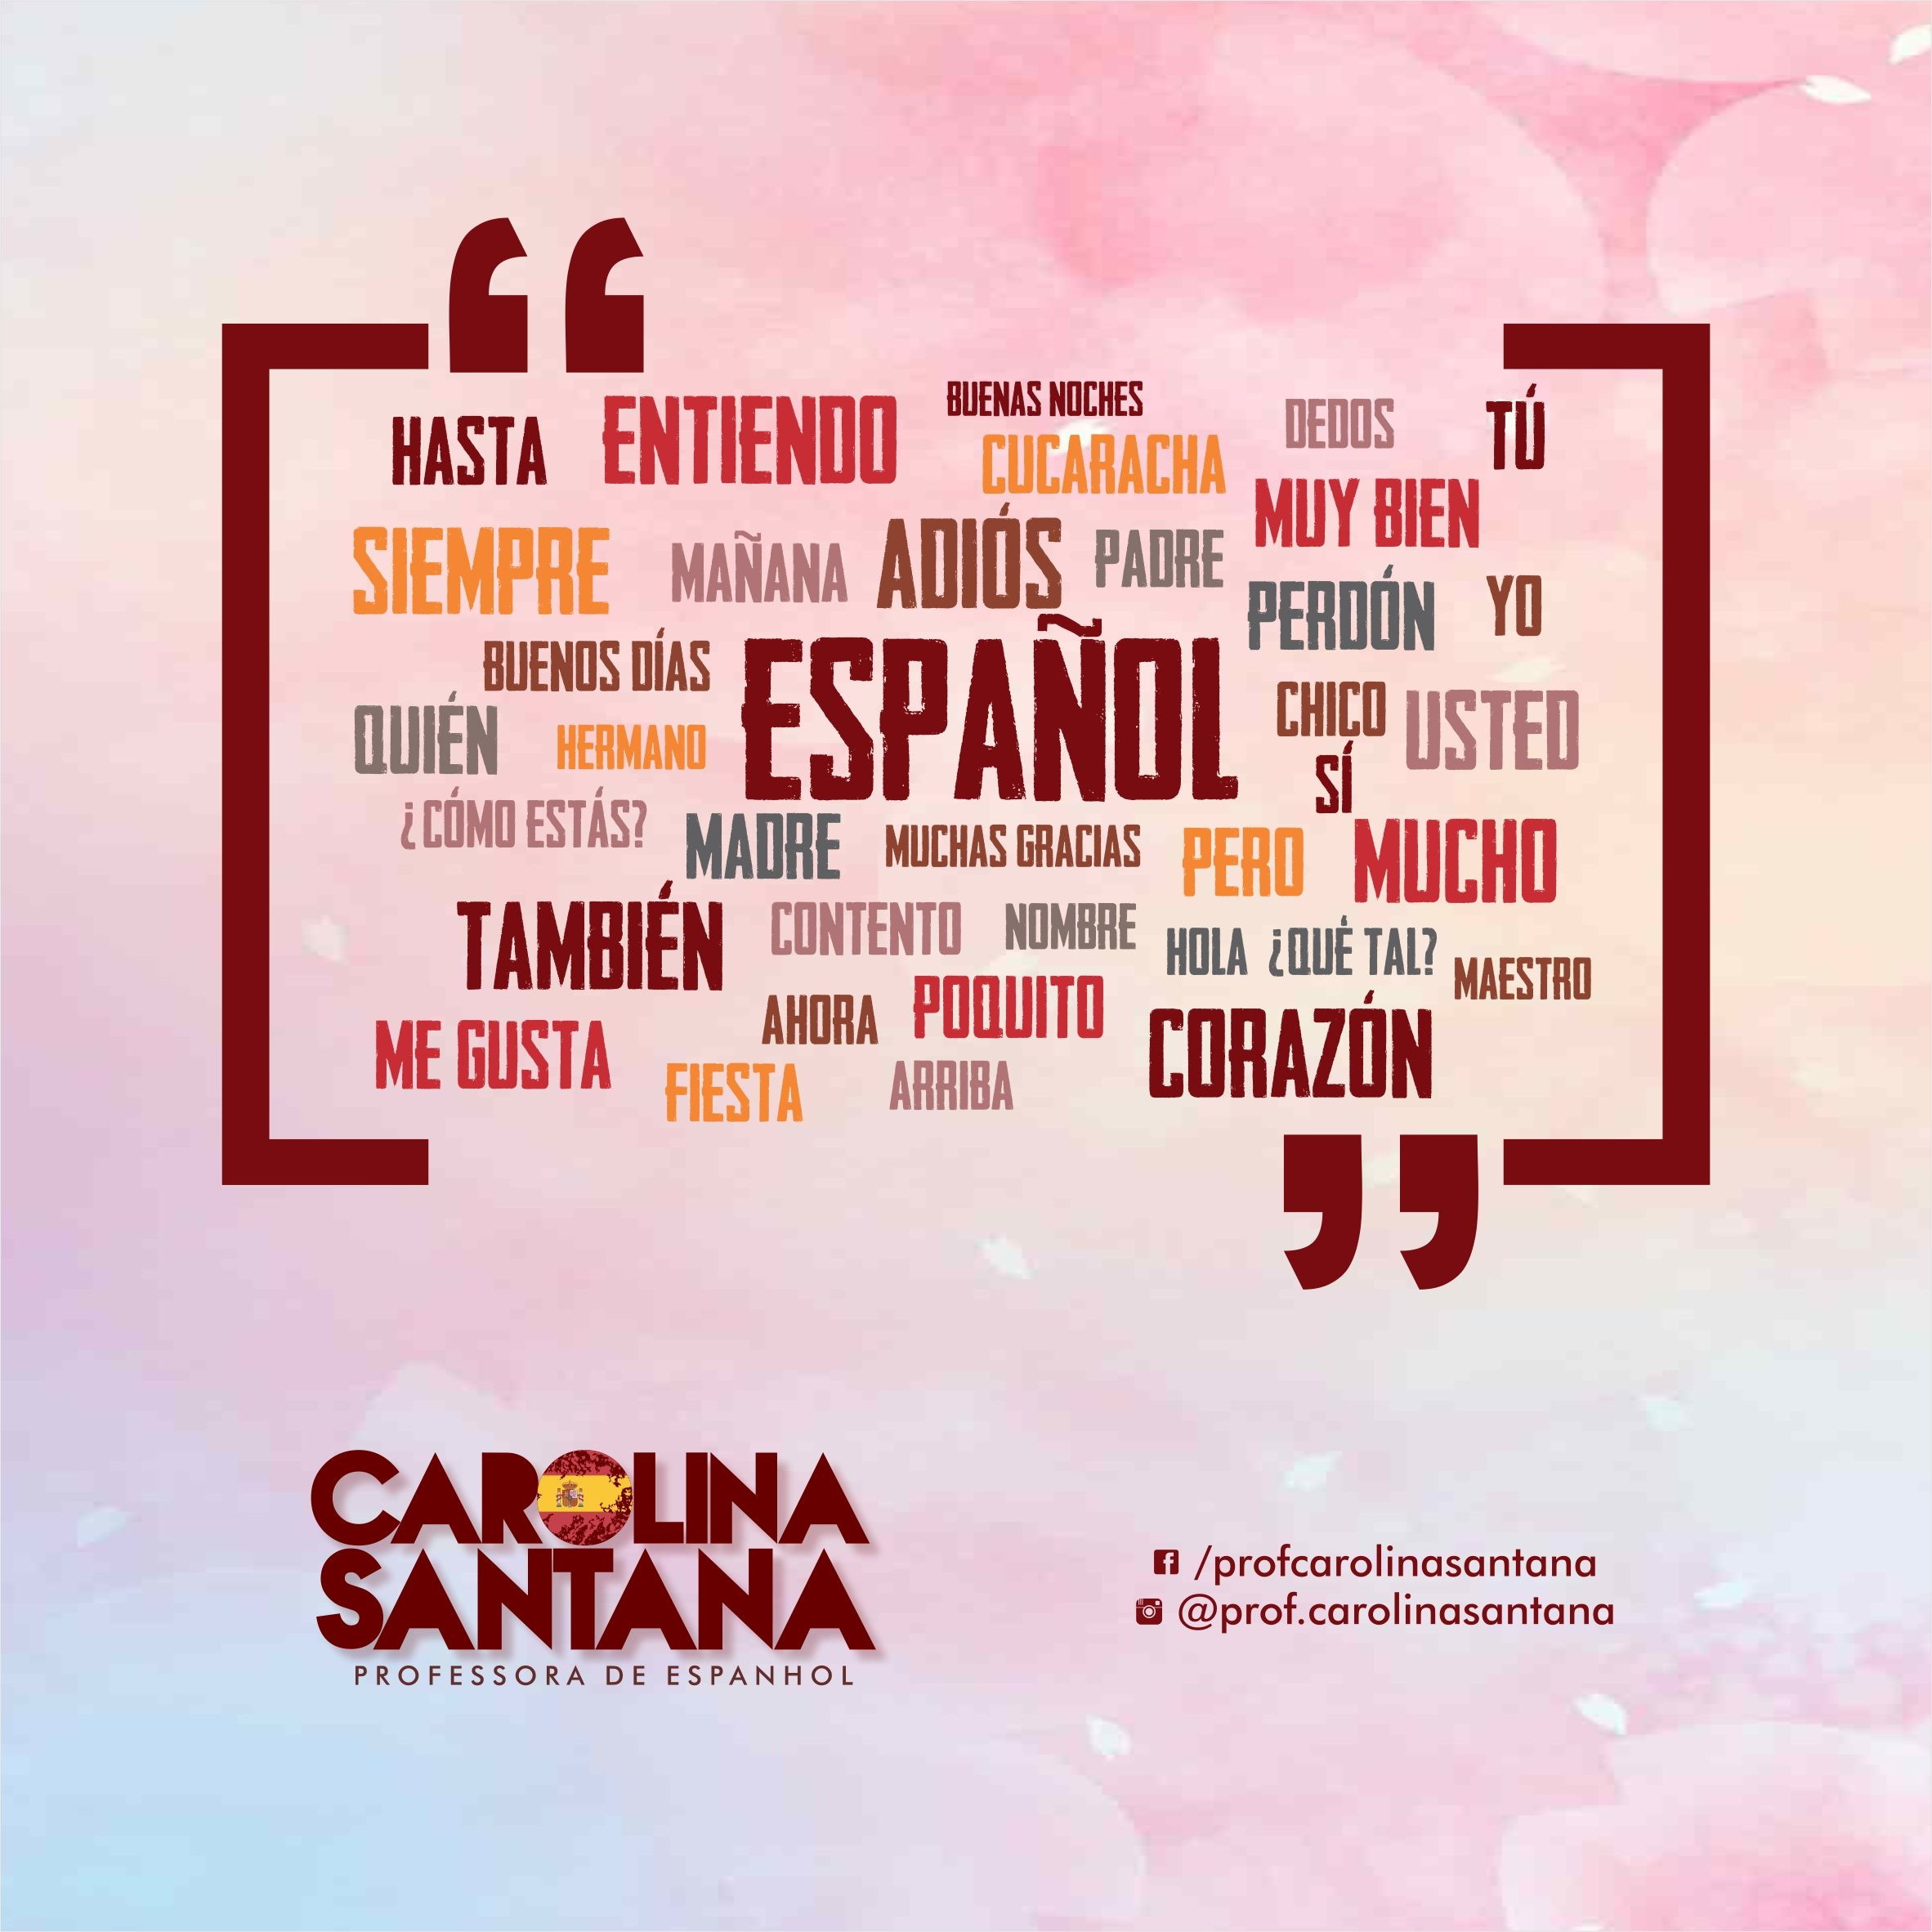 Habla Espanol Espanol Basico